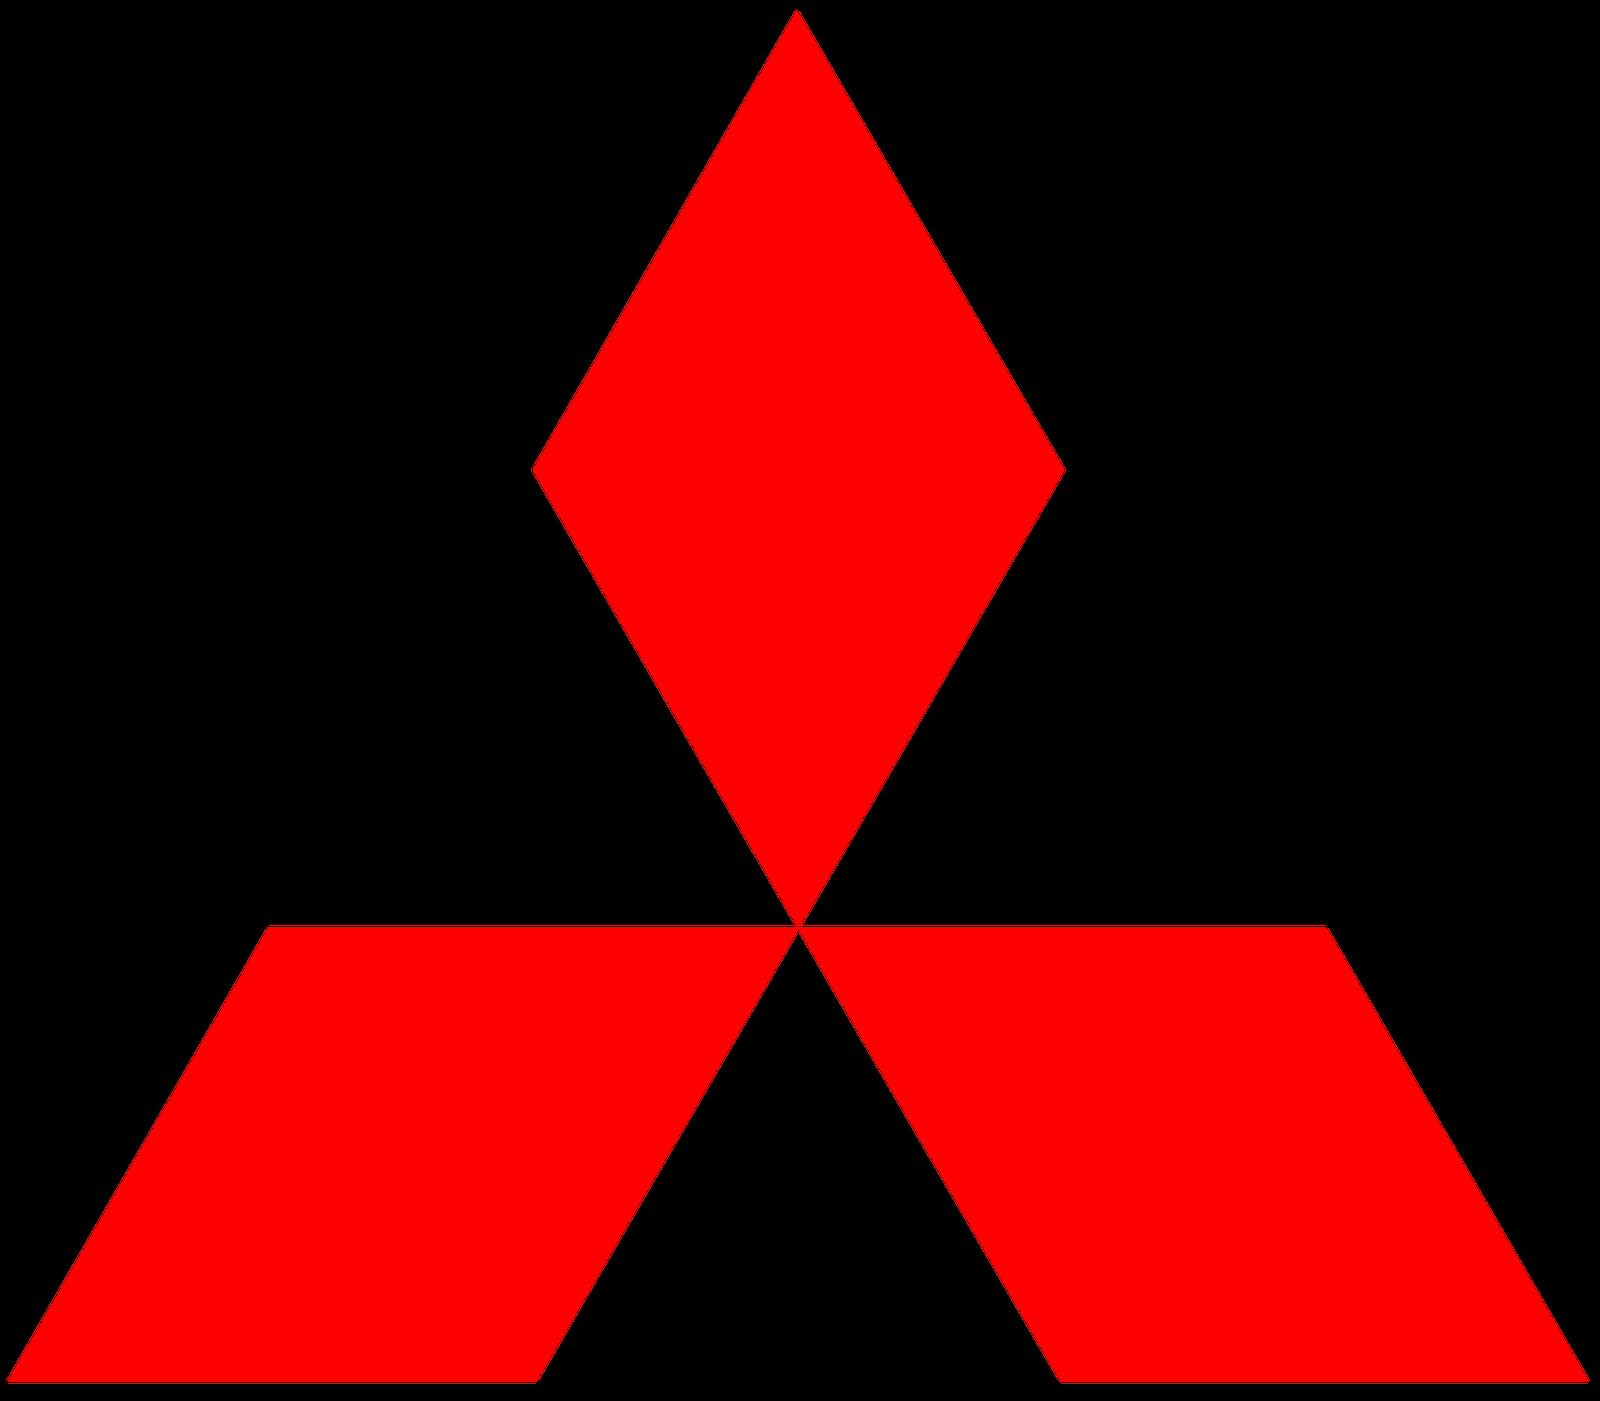 Mitsubishi Car Logo Png Brand Image - Car, Transparent background PNG HD thumbnail